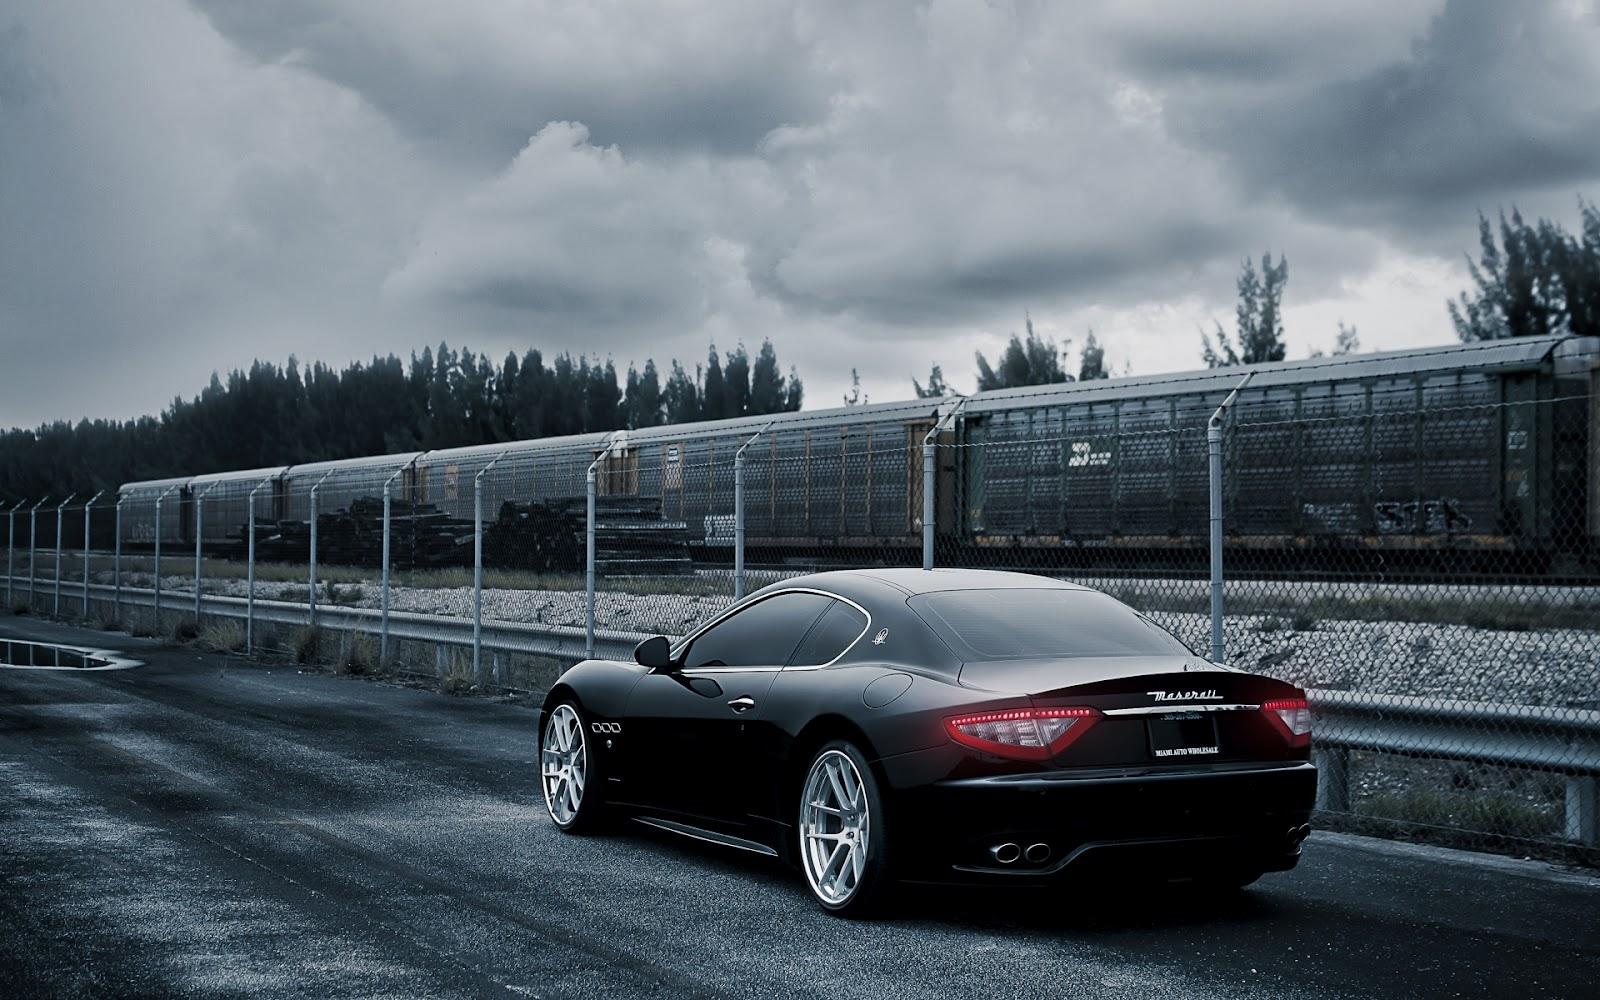 http://1.bp.blogspot.com/-bTBvJJc6ItI/T9d76hNjffI/AAAAAAAAfJc/t656TzPM3HY/s1600/Maserati-Gran-Turismo_Wallpapers-hd-de-Carros.jpg